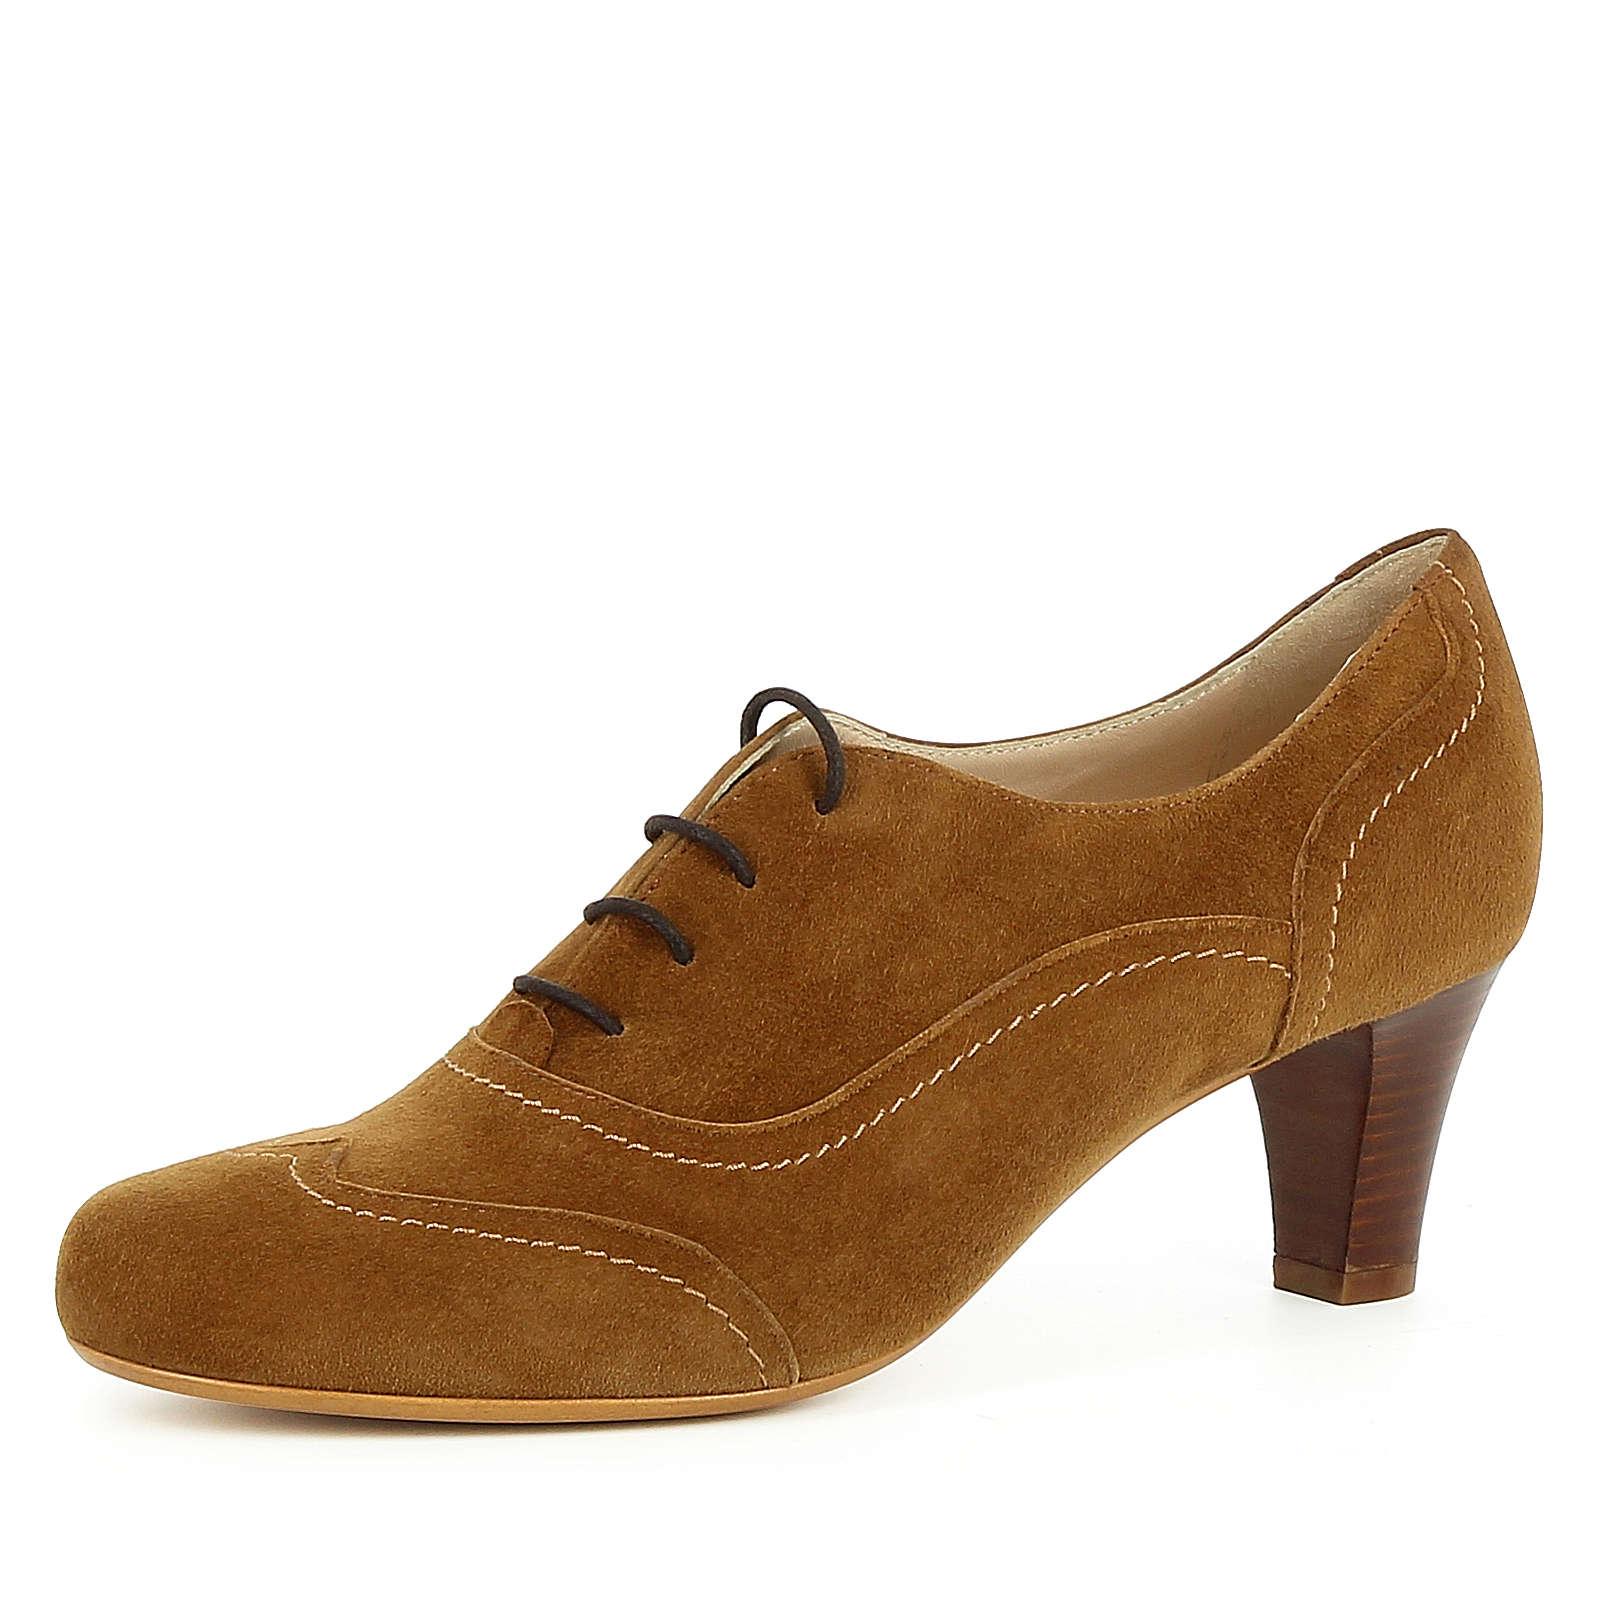 Evita Shoes Damen Pumps GIUSY Schnürpumps cognac Damen Gr. 39